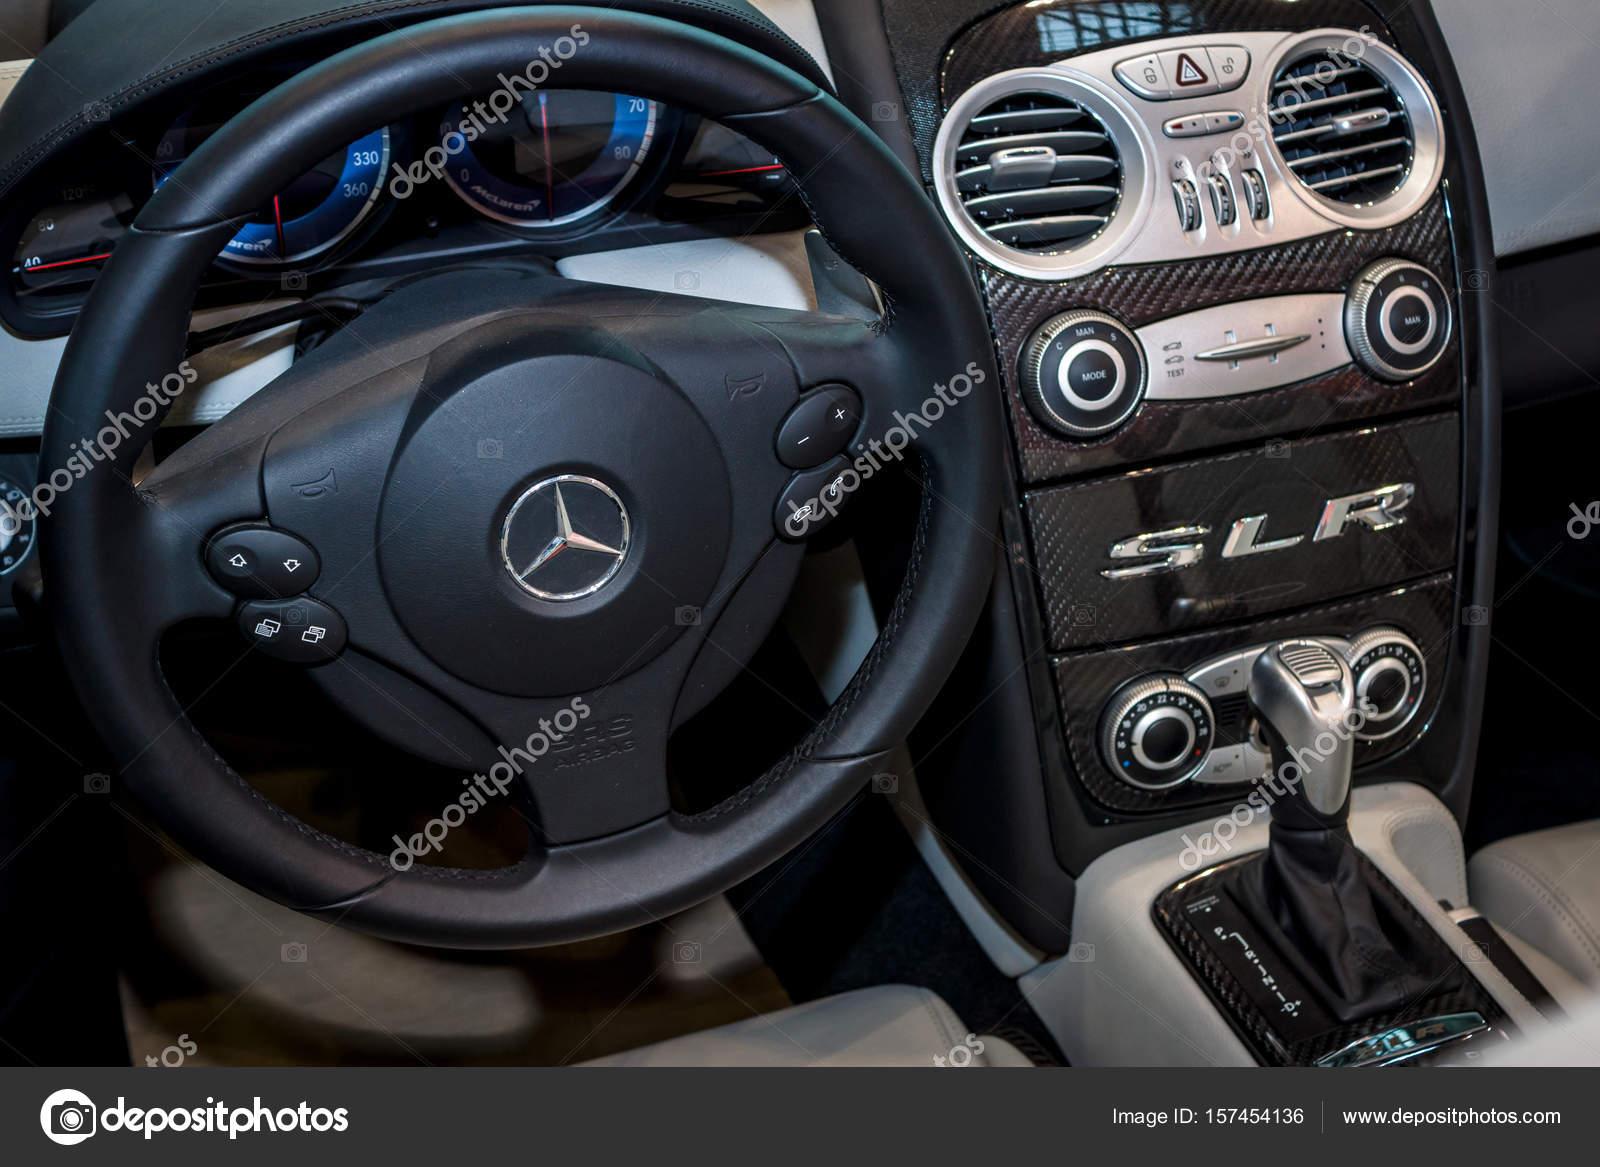 interior of the mercedes-benz slr mclaren. – stock editorial photo